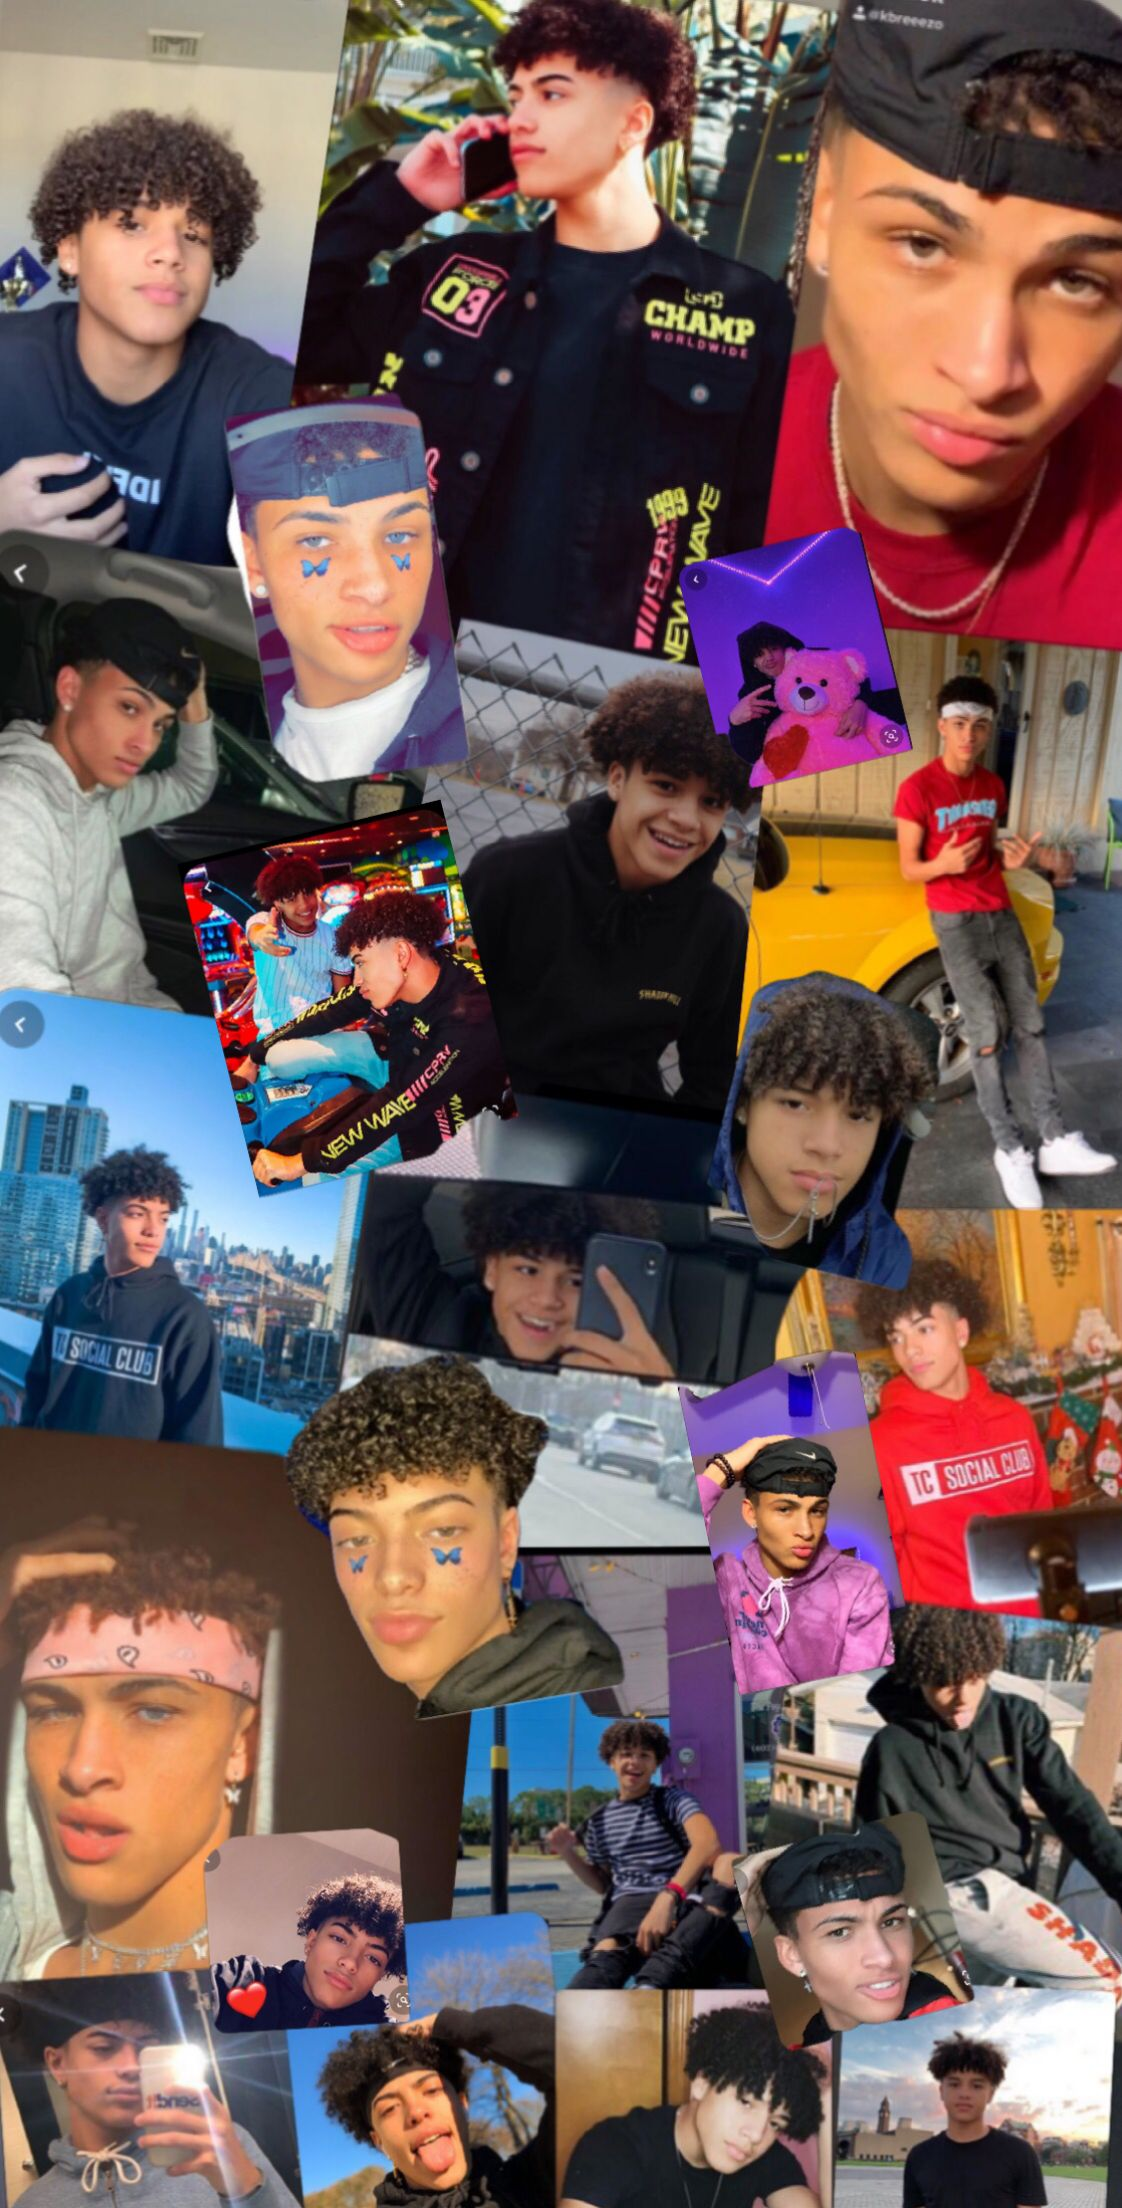 Wallpaper Cute Lightskinned Boys Cute Teenage Boys Cute Boy Things